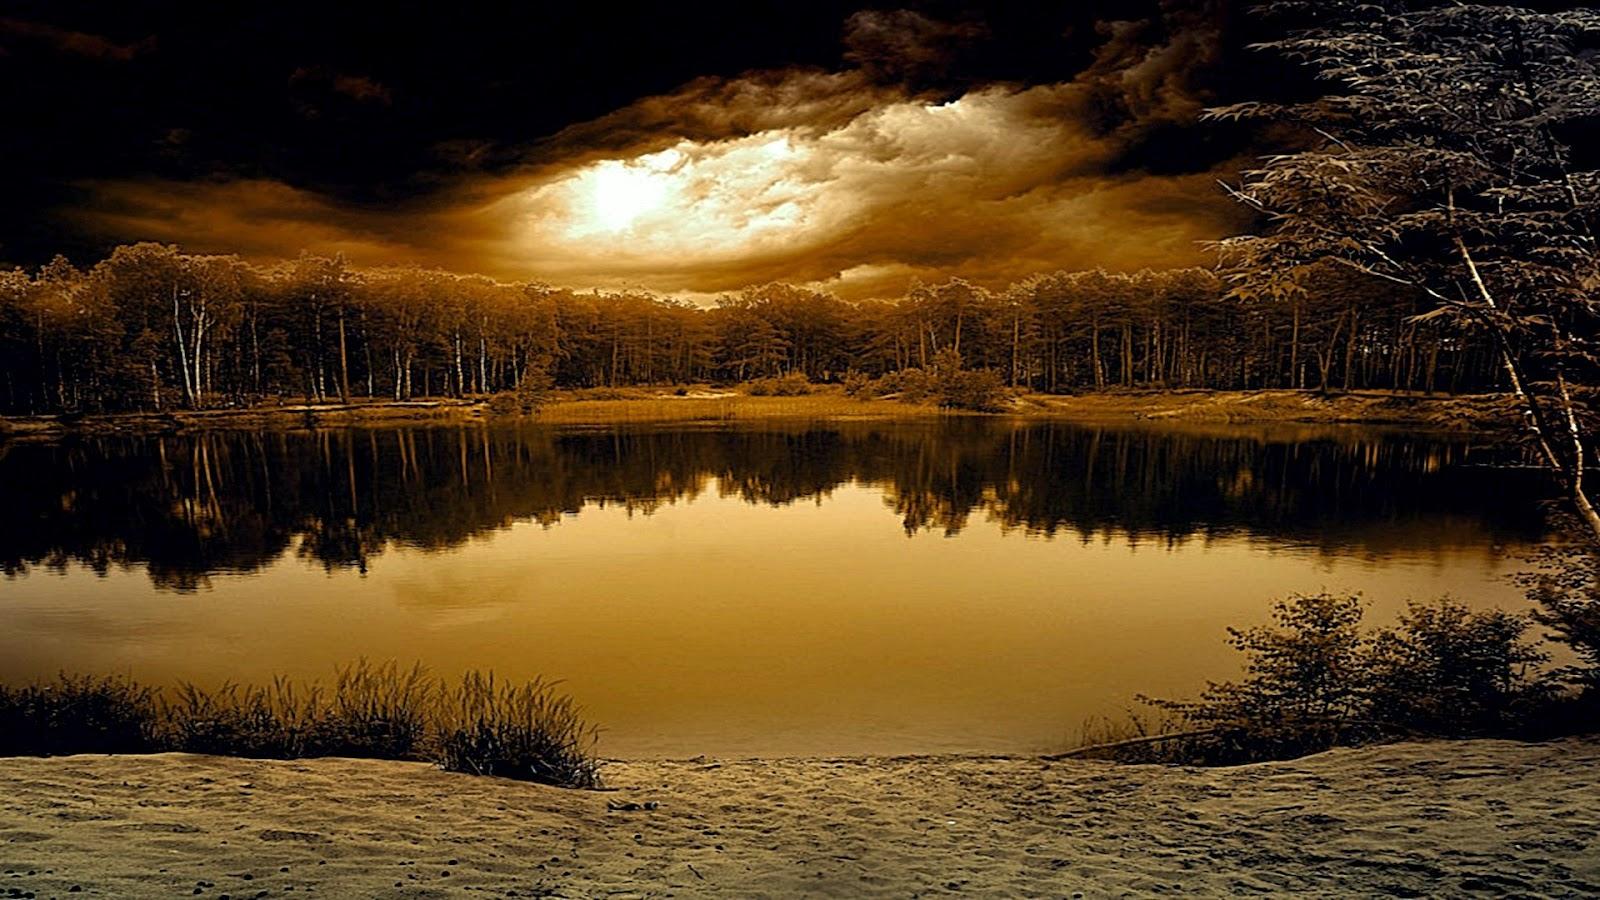 Amazing Nature Beautiful HD Wallpaper Desktop Background - HD Wallpaper & Desktop Background